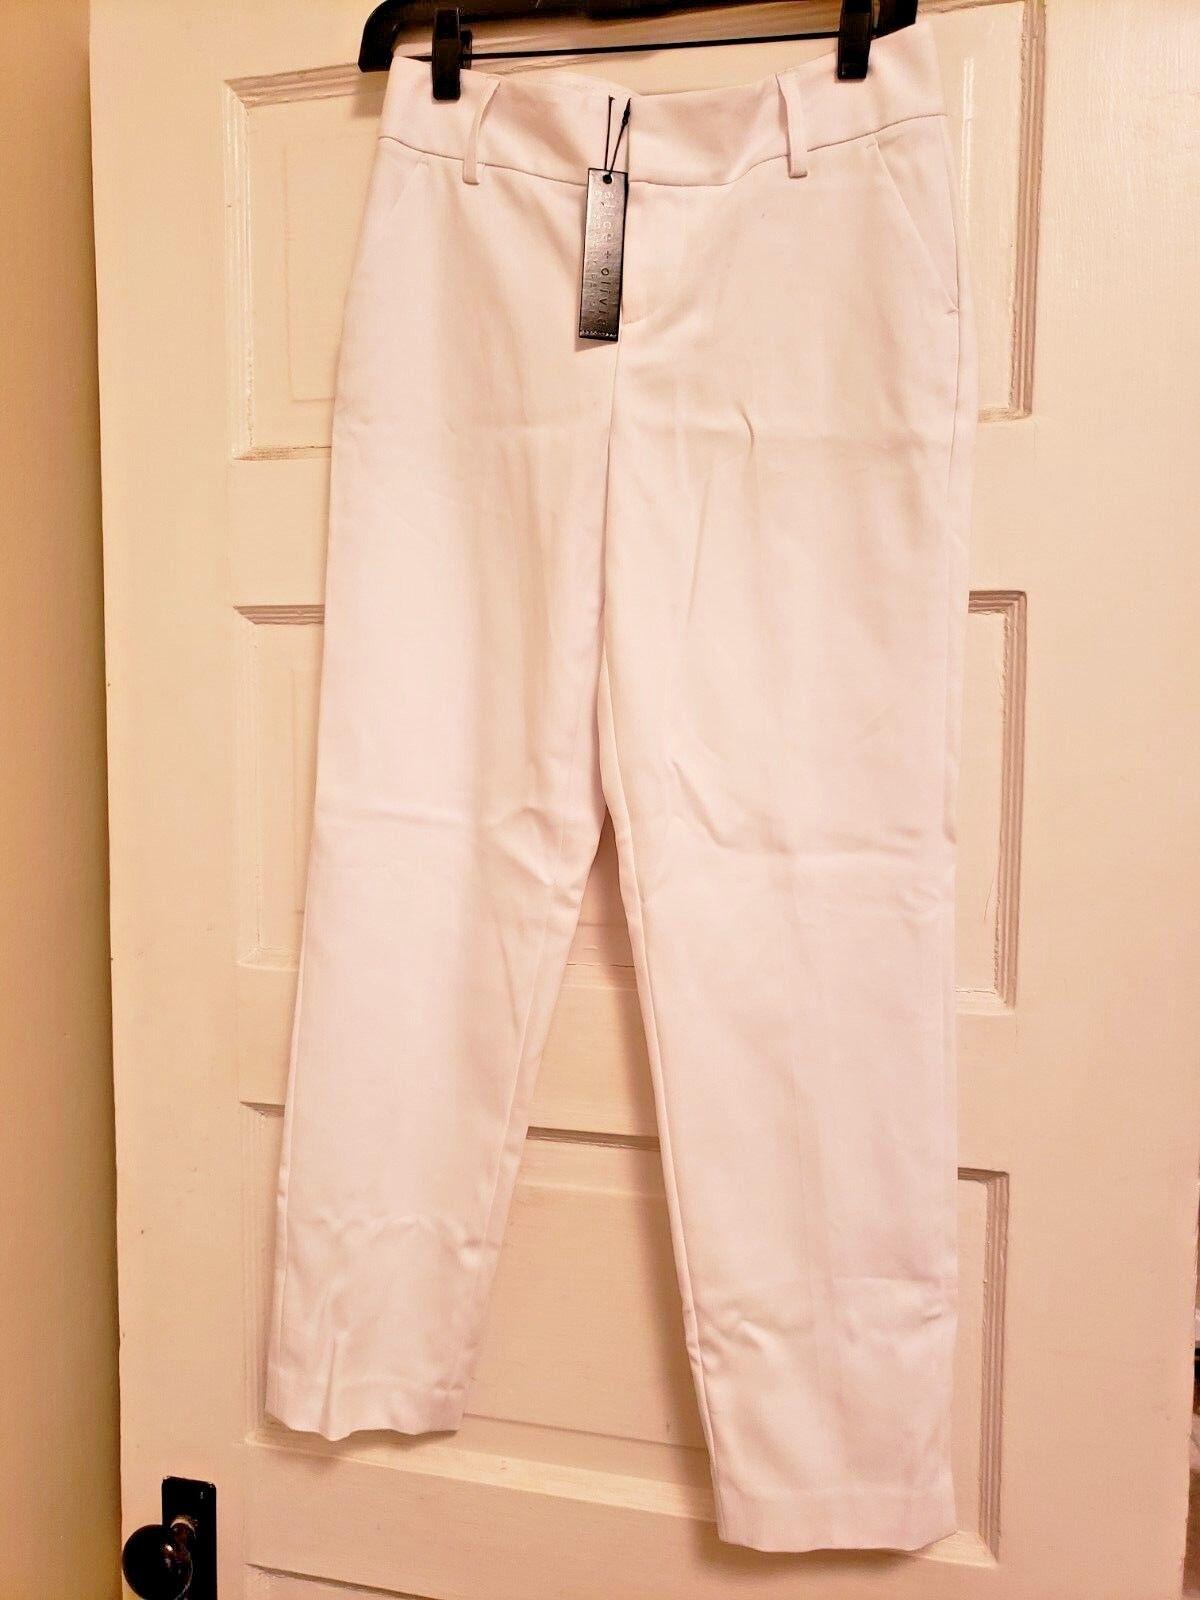 3 items - Women's designer clothing NWT, Size XS S